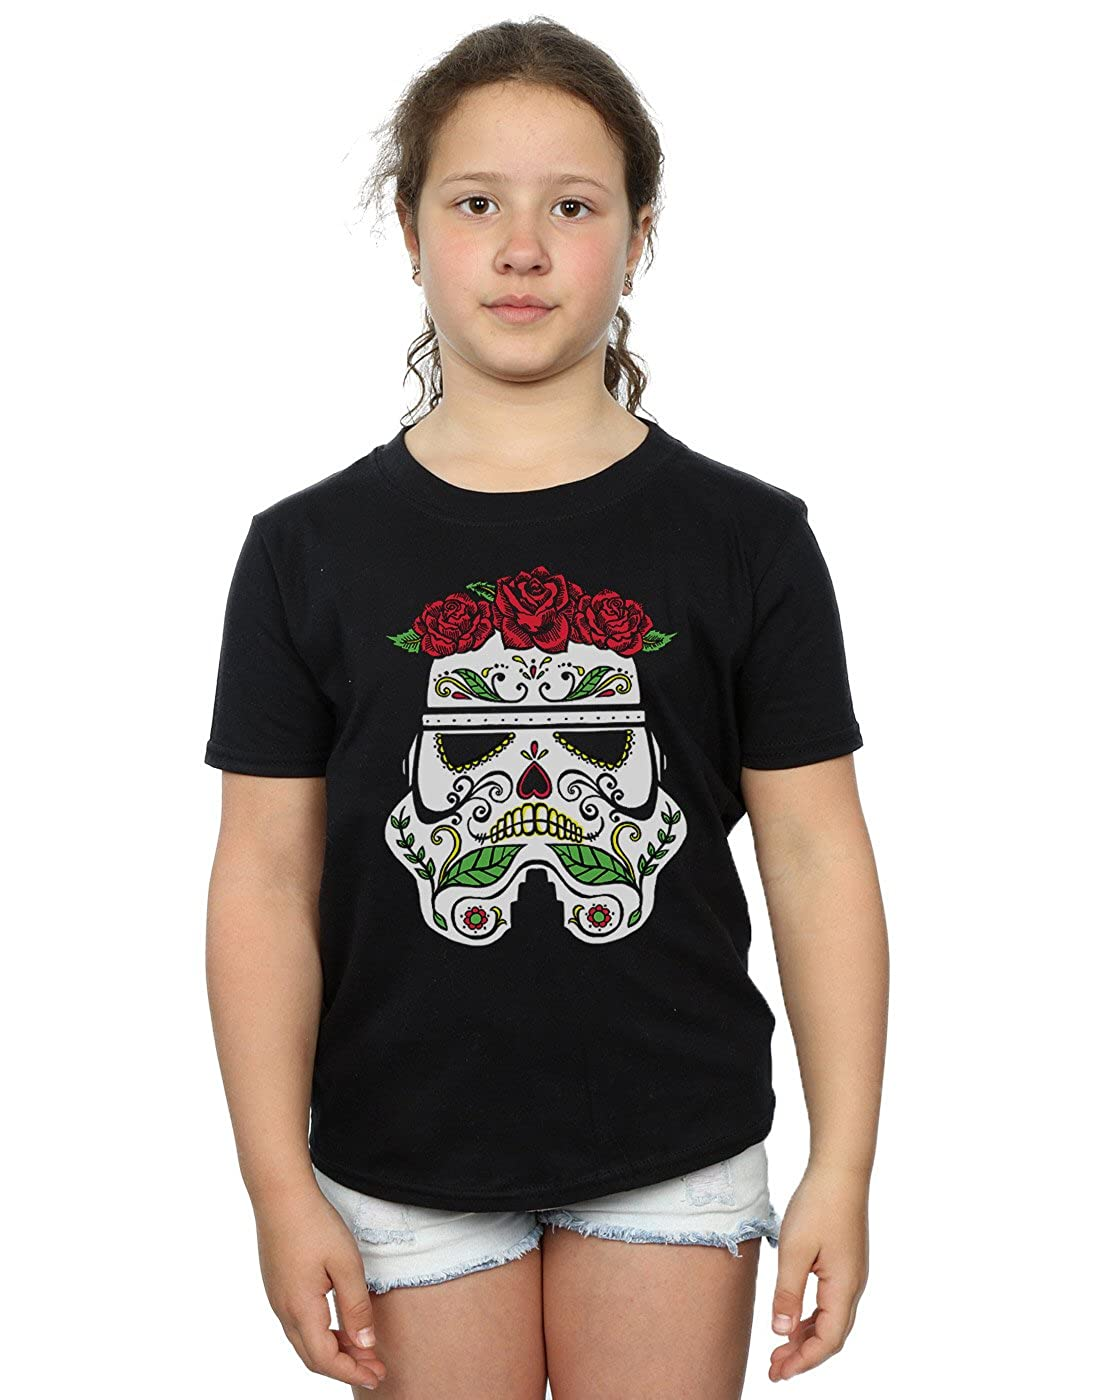 Girls Official Star Wars Stormtrooper Short Sleeve Black T-Shirt  Free P+P